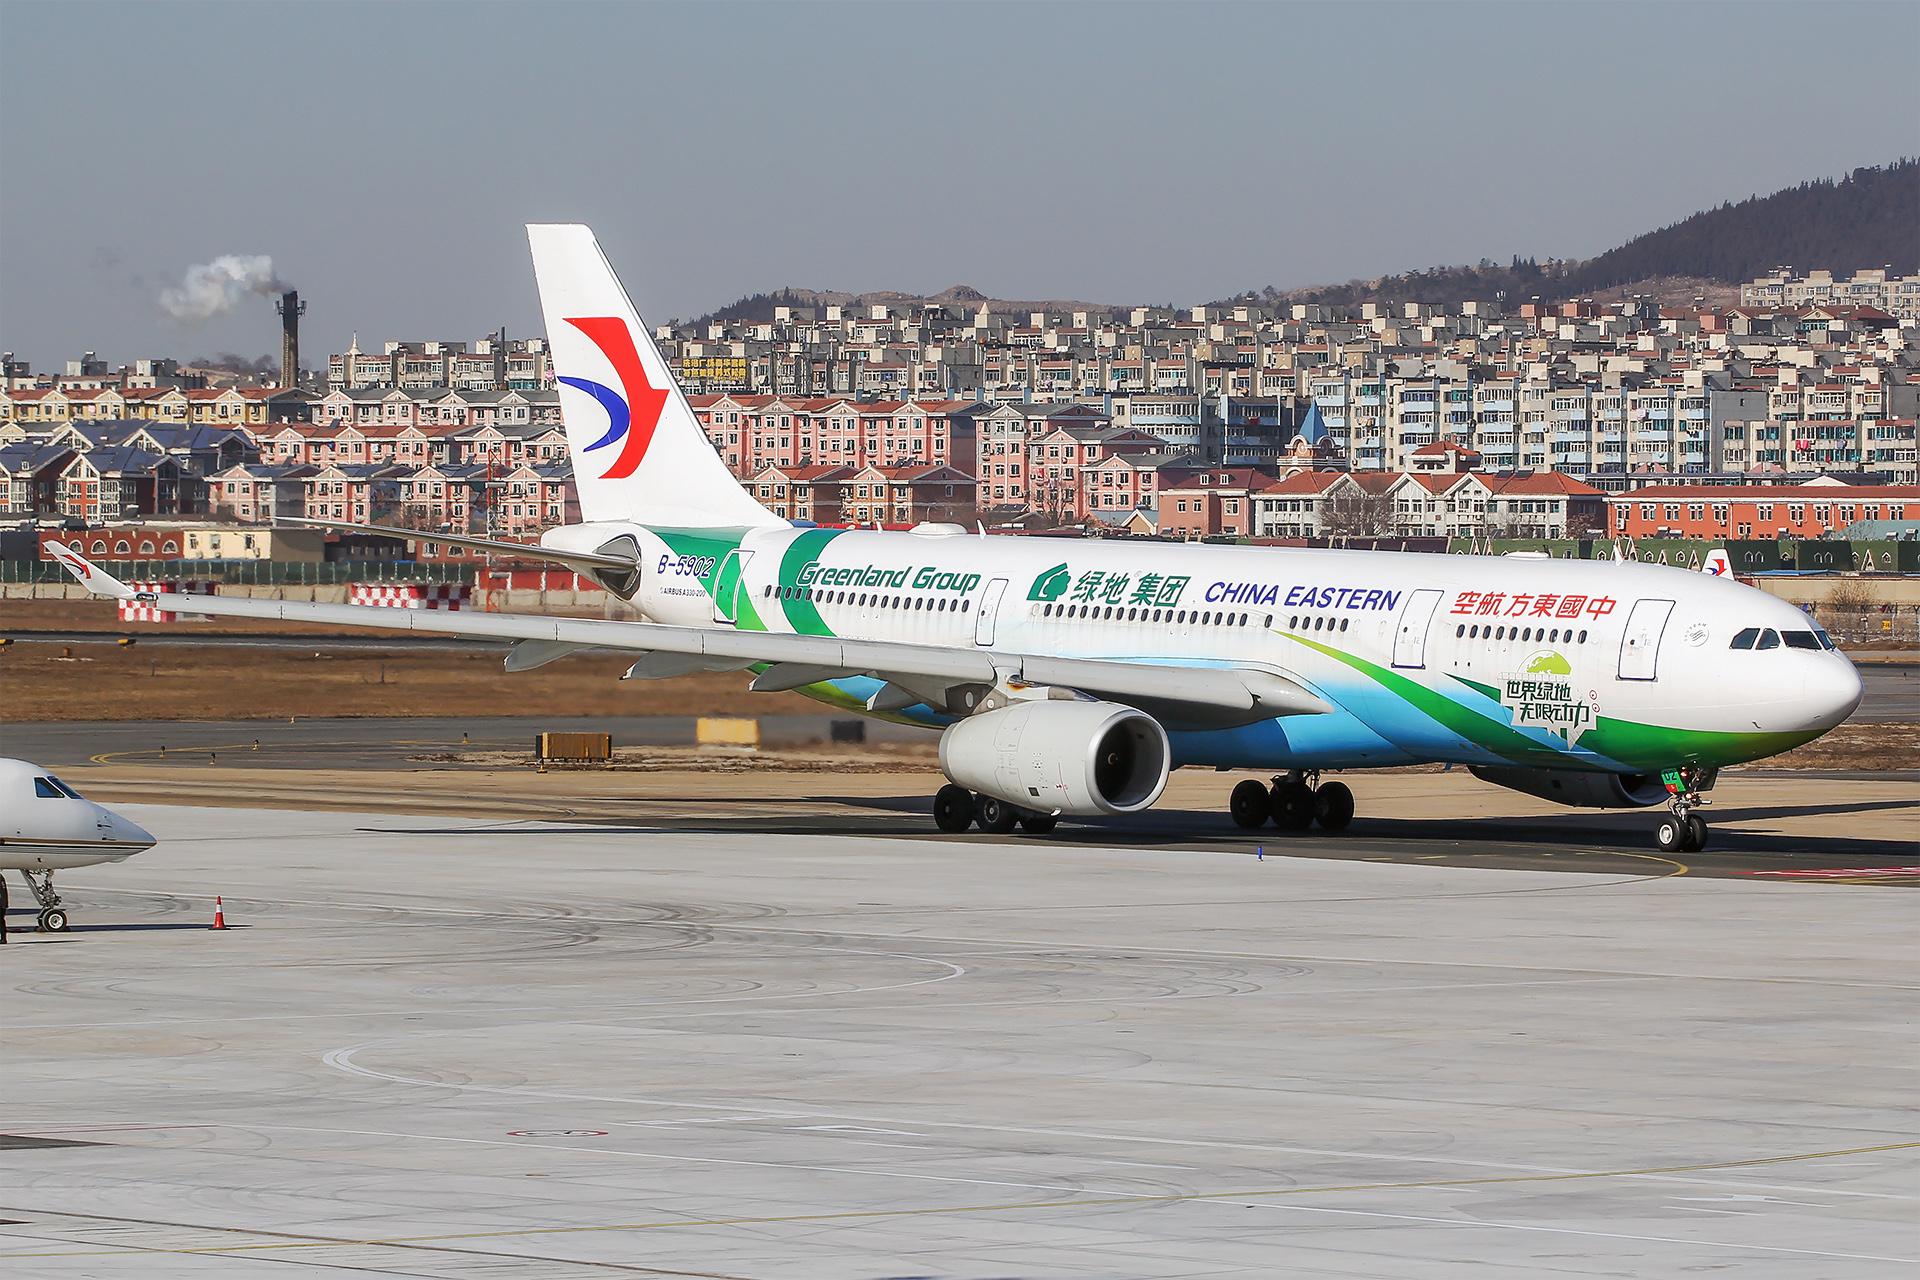 Re:[原创][DLC]。。。世界品味 东方魅力 世界绿地 无限动力。。。 AIRBUS A330-200 B-5902 中国大连国际机场